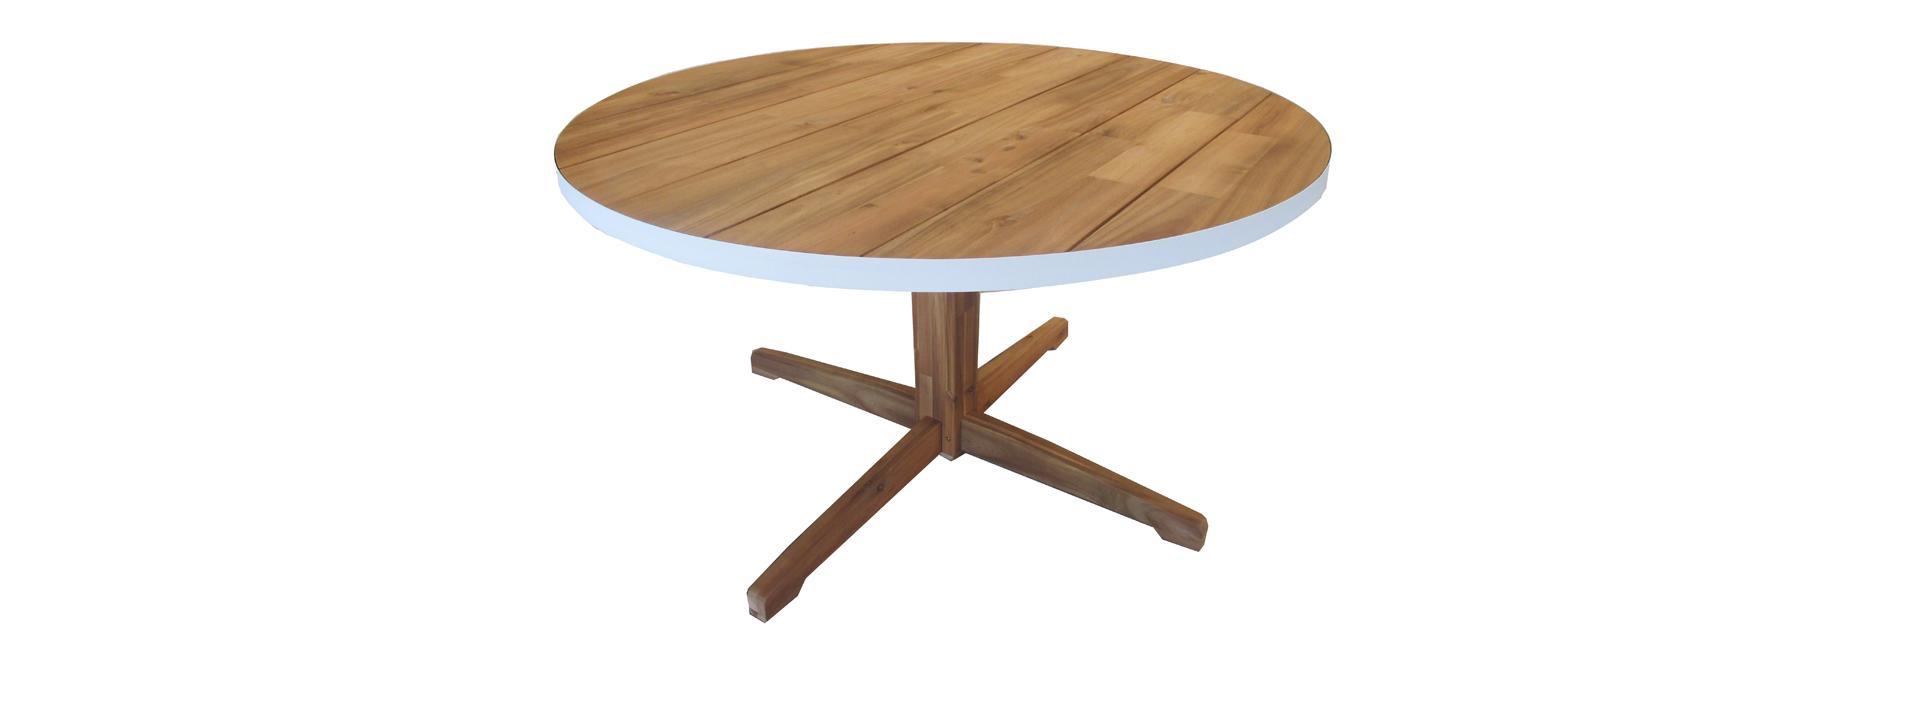 Hambledon round table single leg (984)